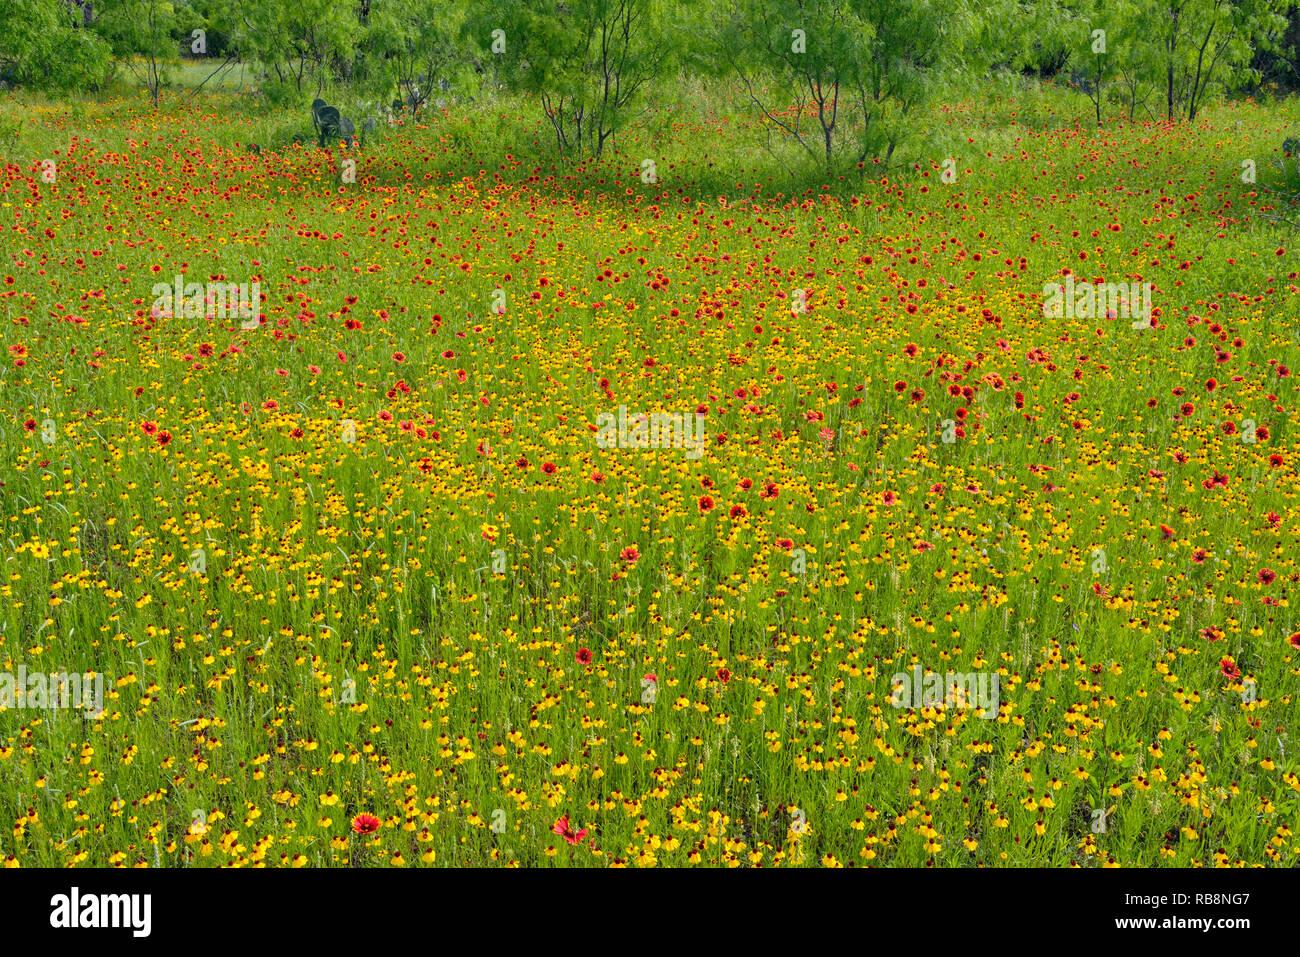 Spring wildflowers, Llano County, Texas, USA - Stock Image